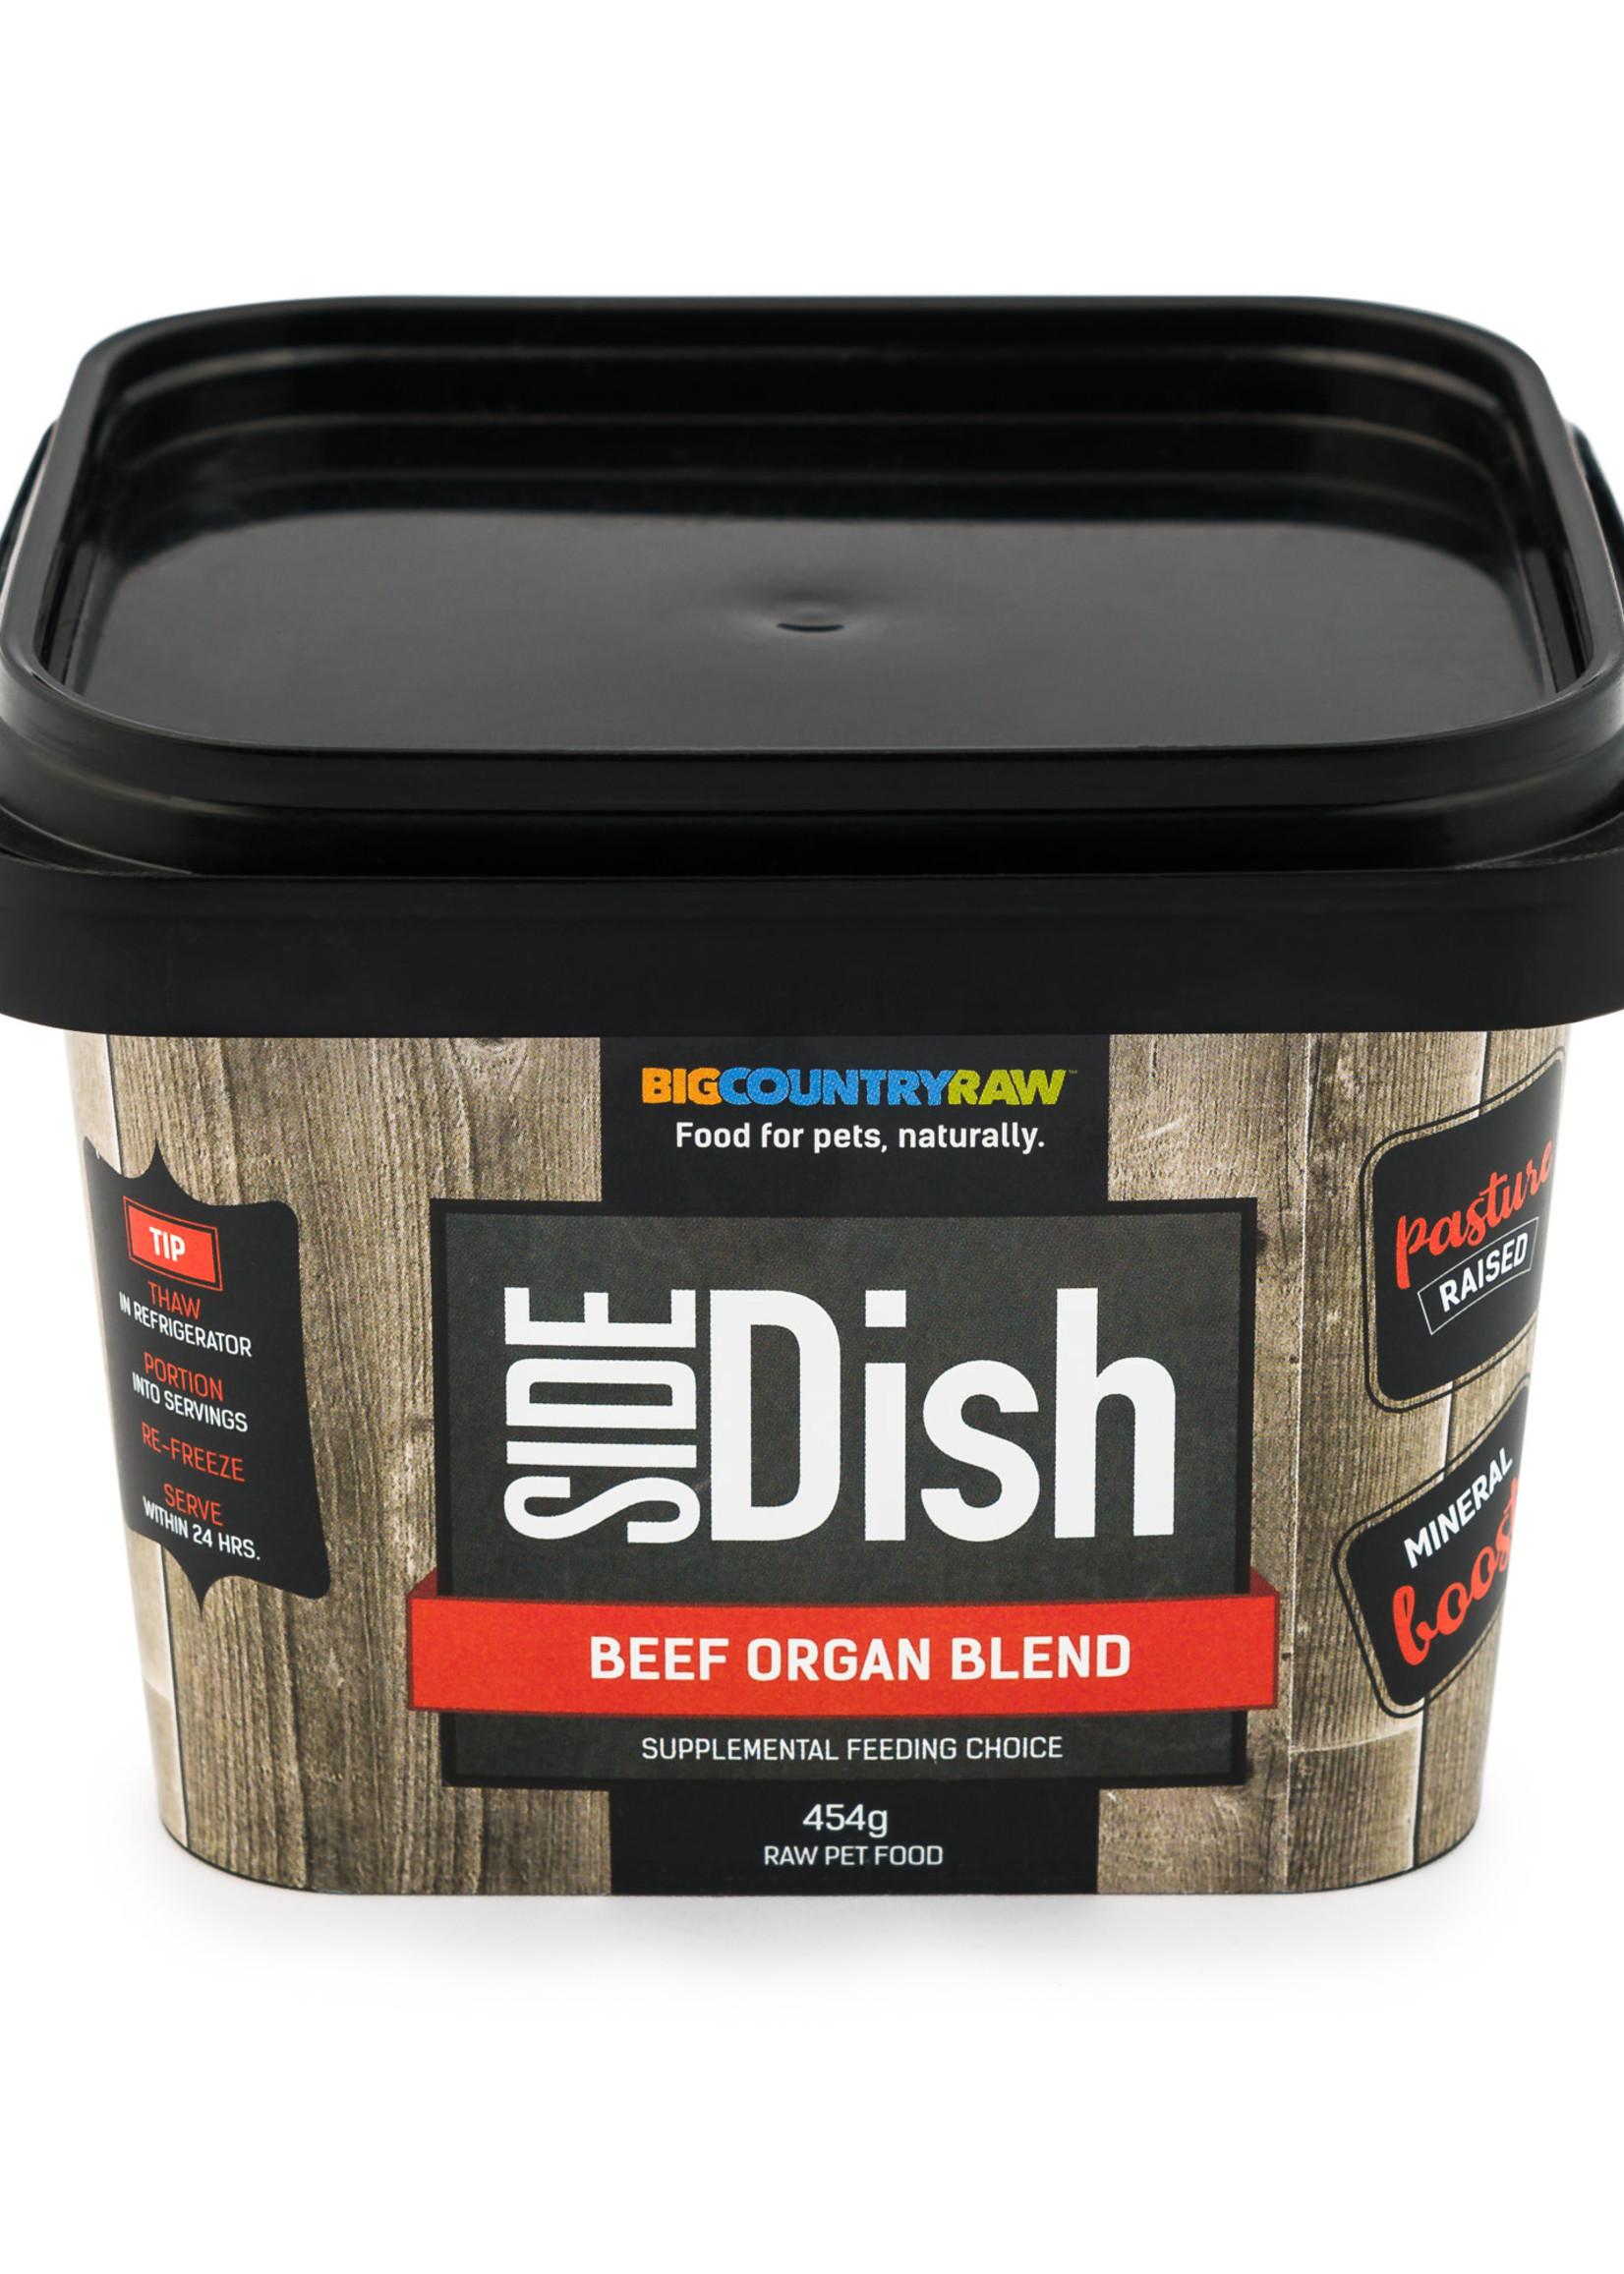 Big Country Raw  Big Country Raw Side Dish Beef Organ Blend 1lb